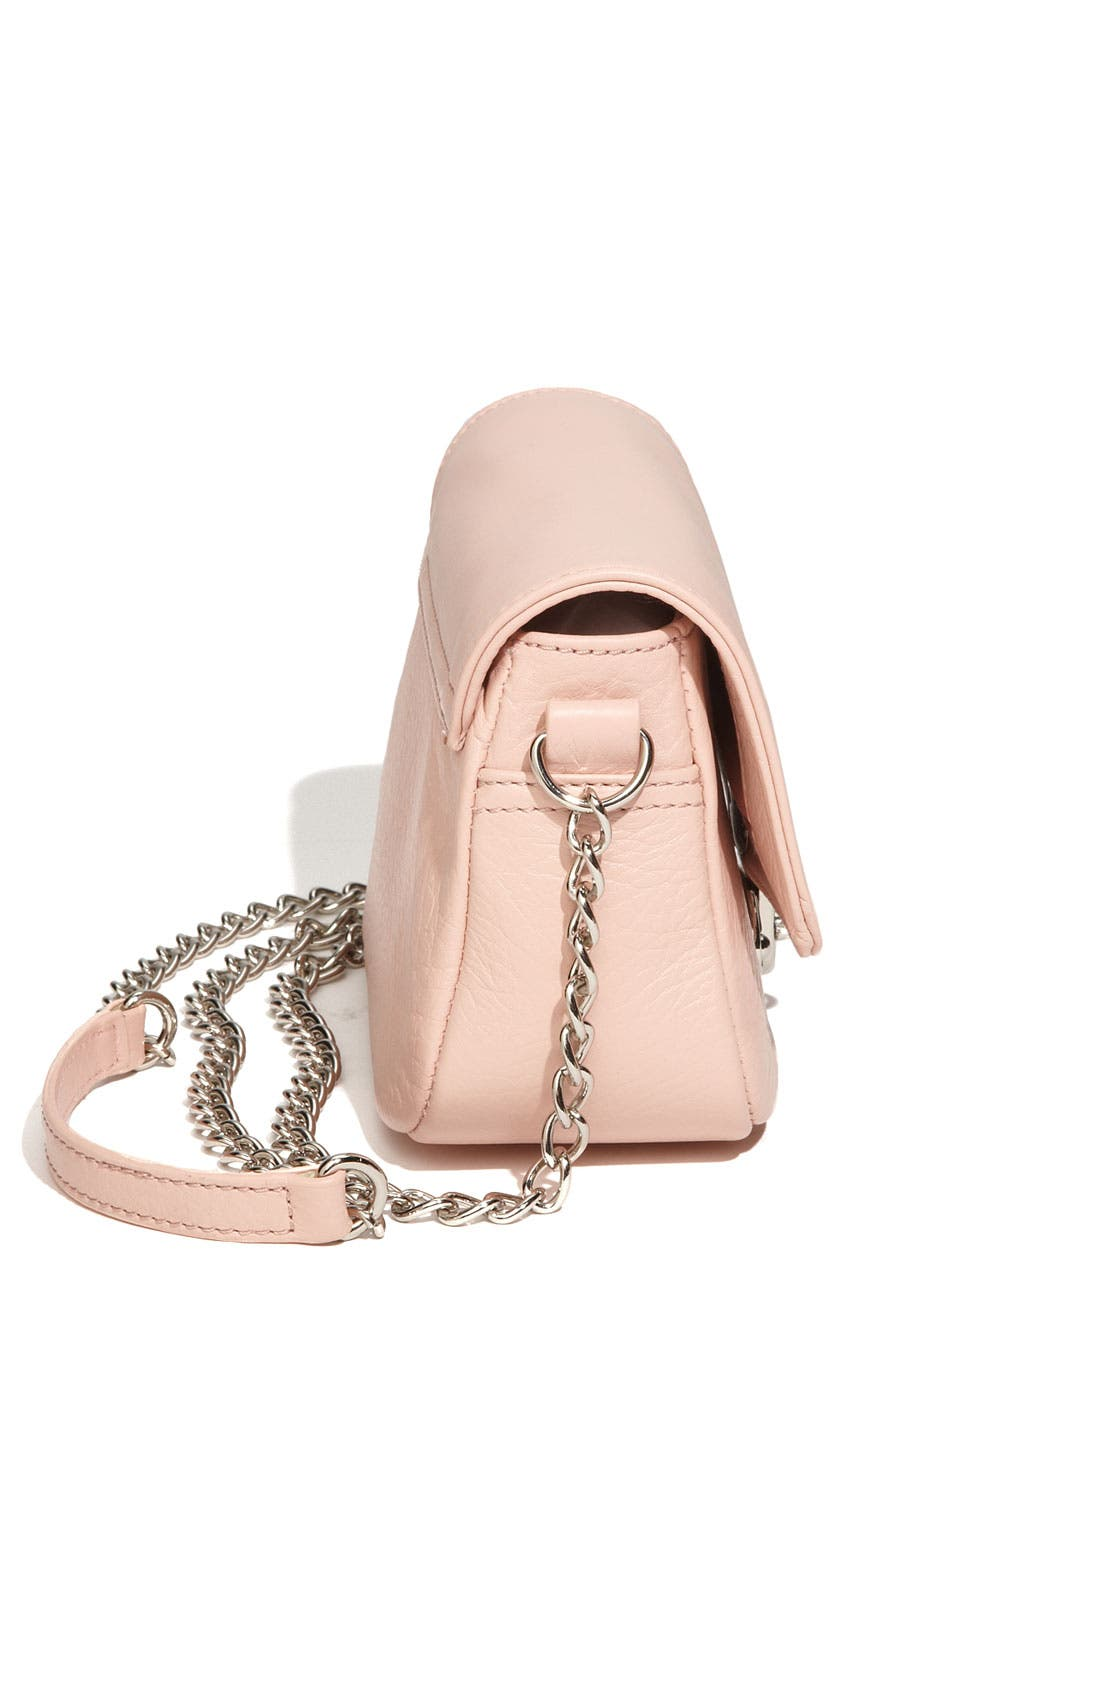 Alternate Image 2  - Franchi Leather Flap Crossbody Bag